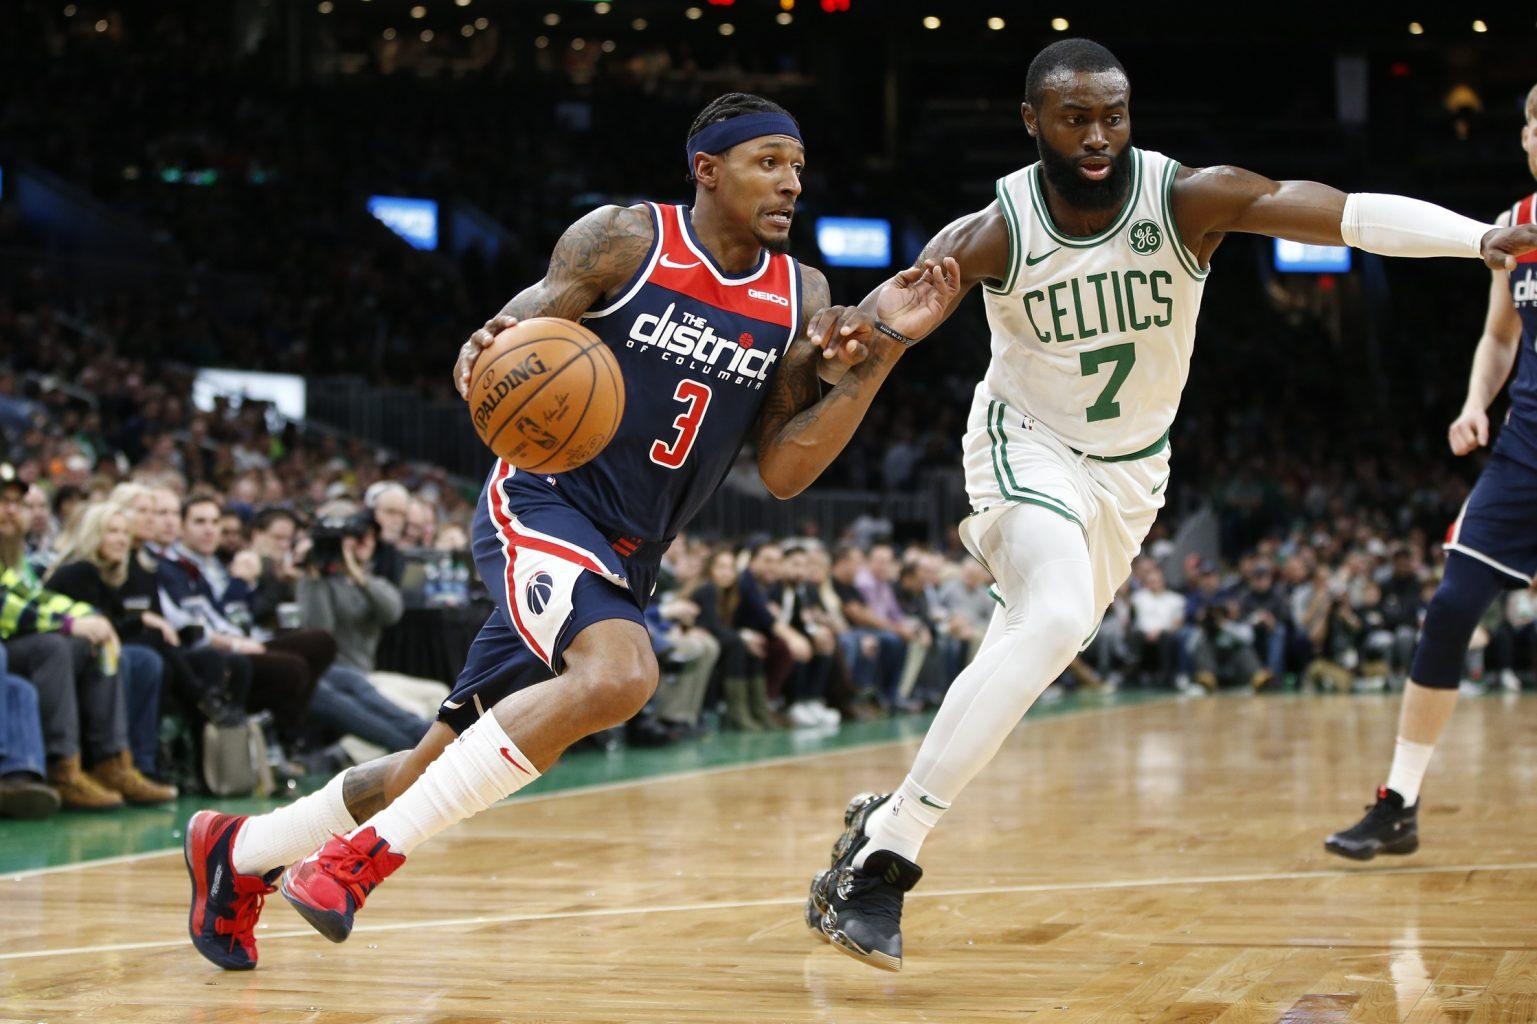 Rapid Recap: Celtics make it through Wizards shootout for 9th straight W